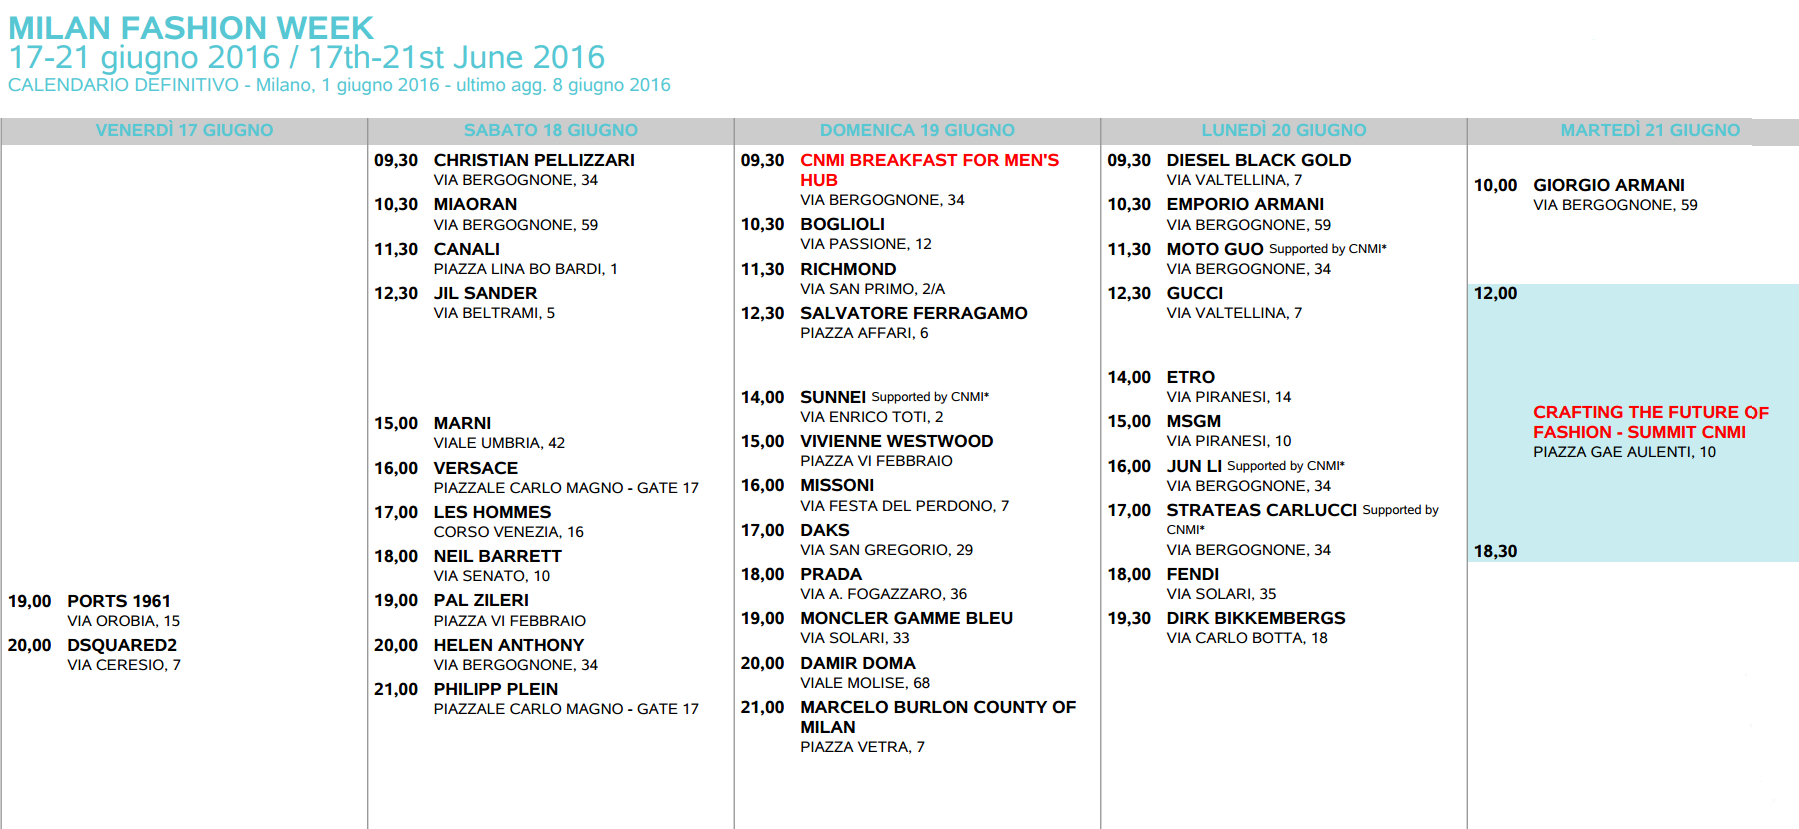 Calendario Milano.Milano Moda Uomo 2016 Calendario Eventi Con Date Orari